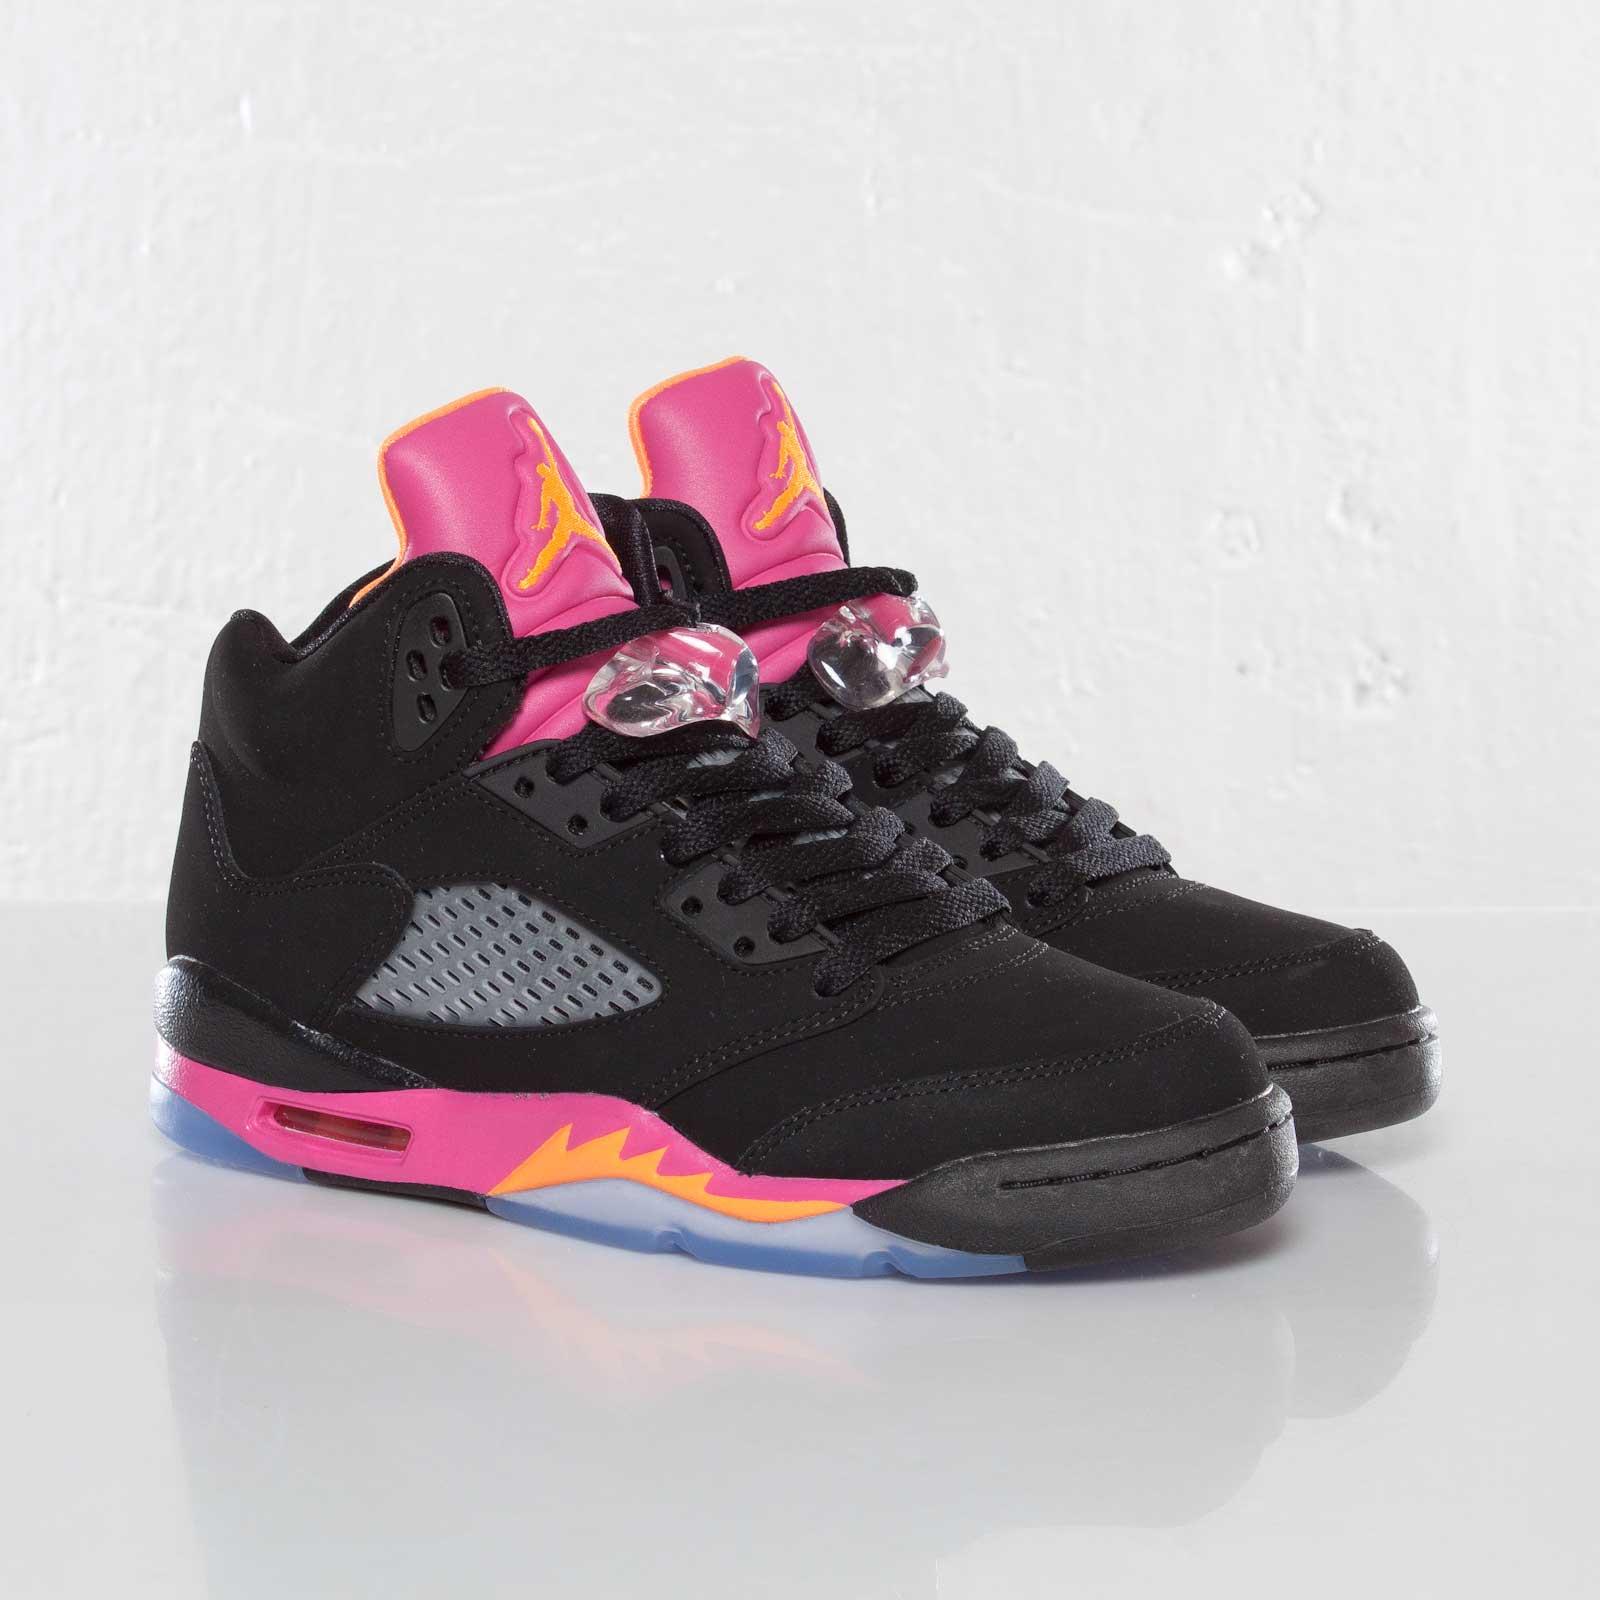 b63efd016c90 Jordan Brand Girls Air Jordan 5 Retro (GS) - 440892-067 ...